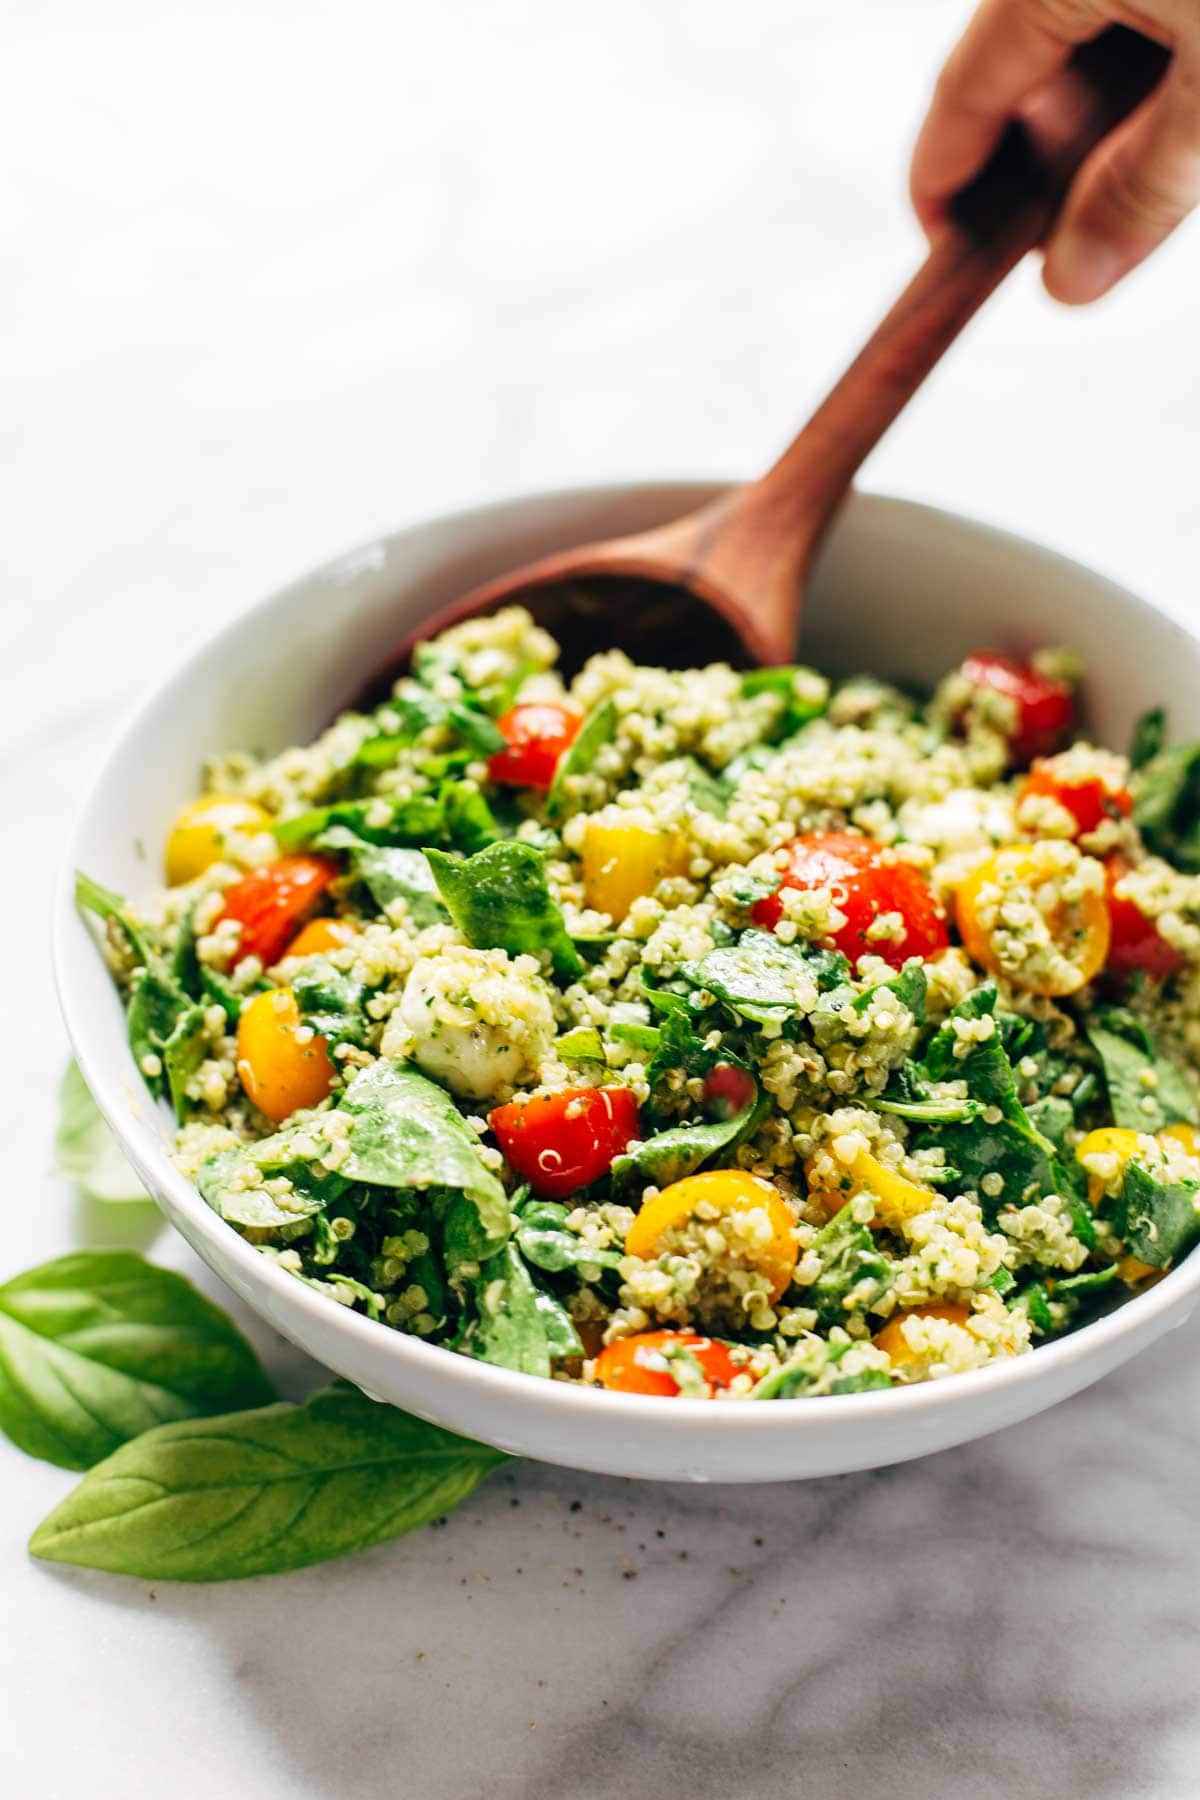 Summer Quinoa Recipes  Green Goddess Quinoa Summer Salad Recipe Pinch of Yum